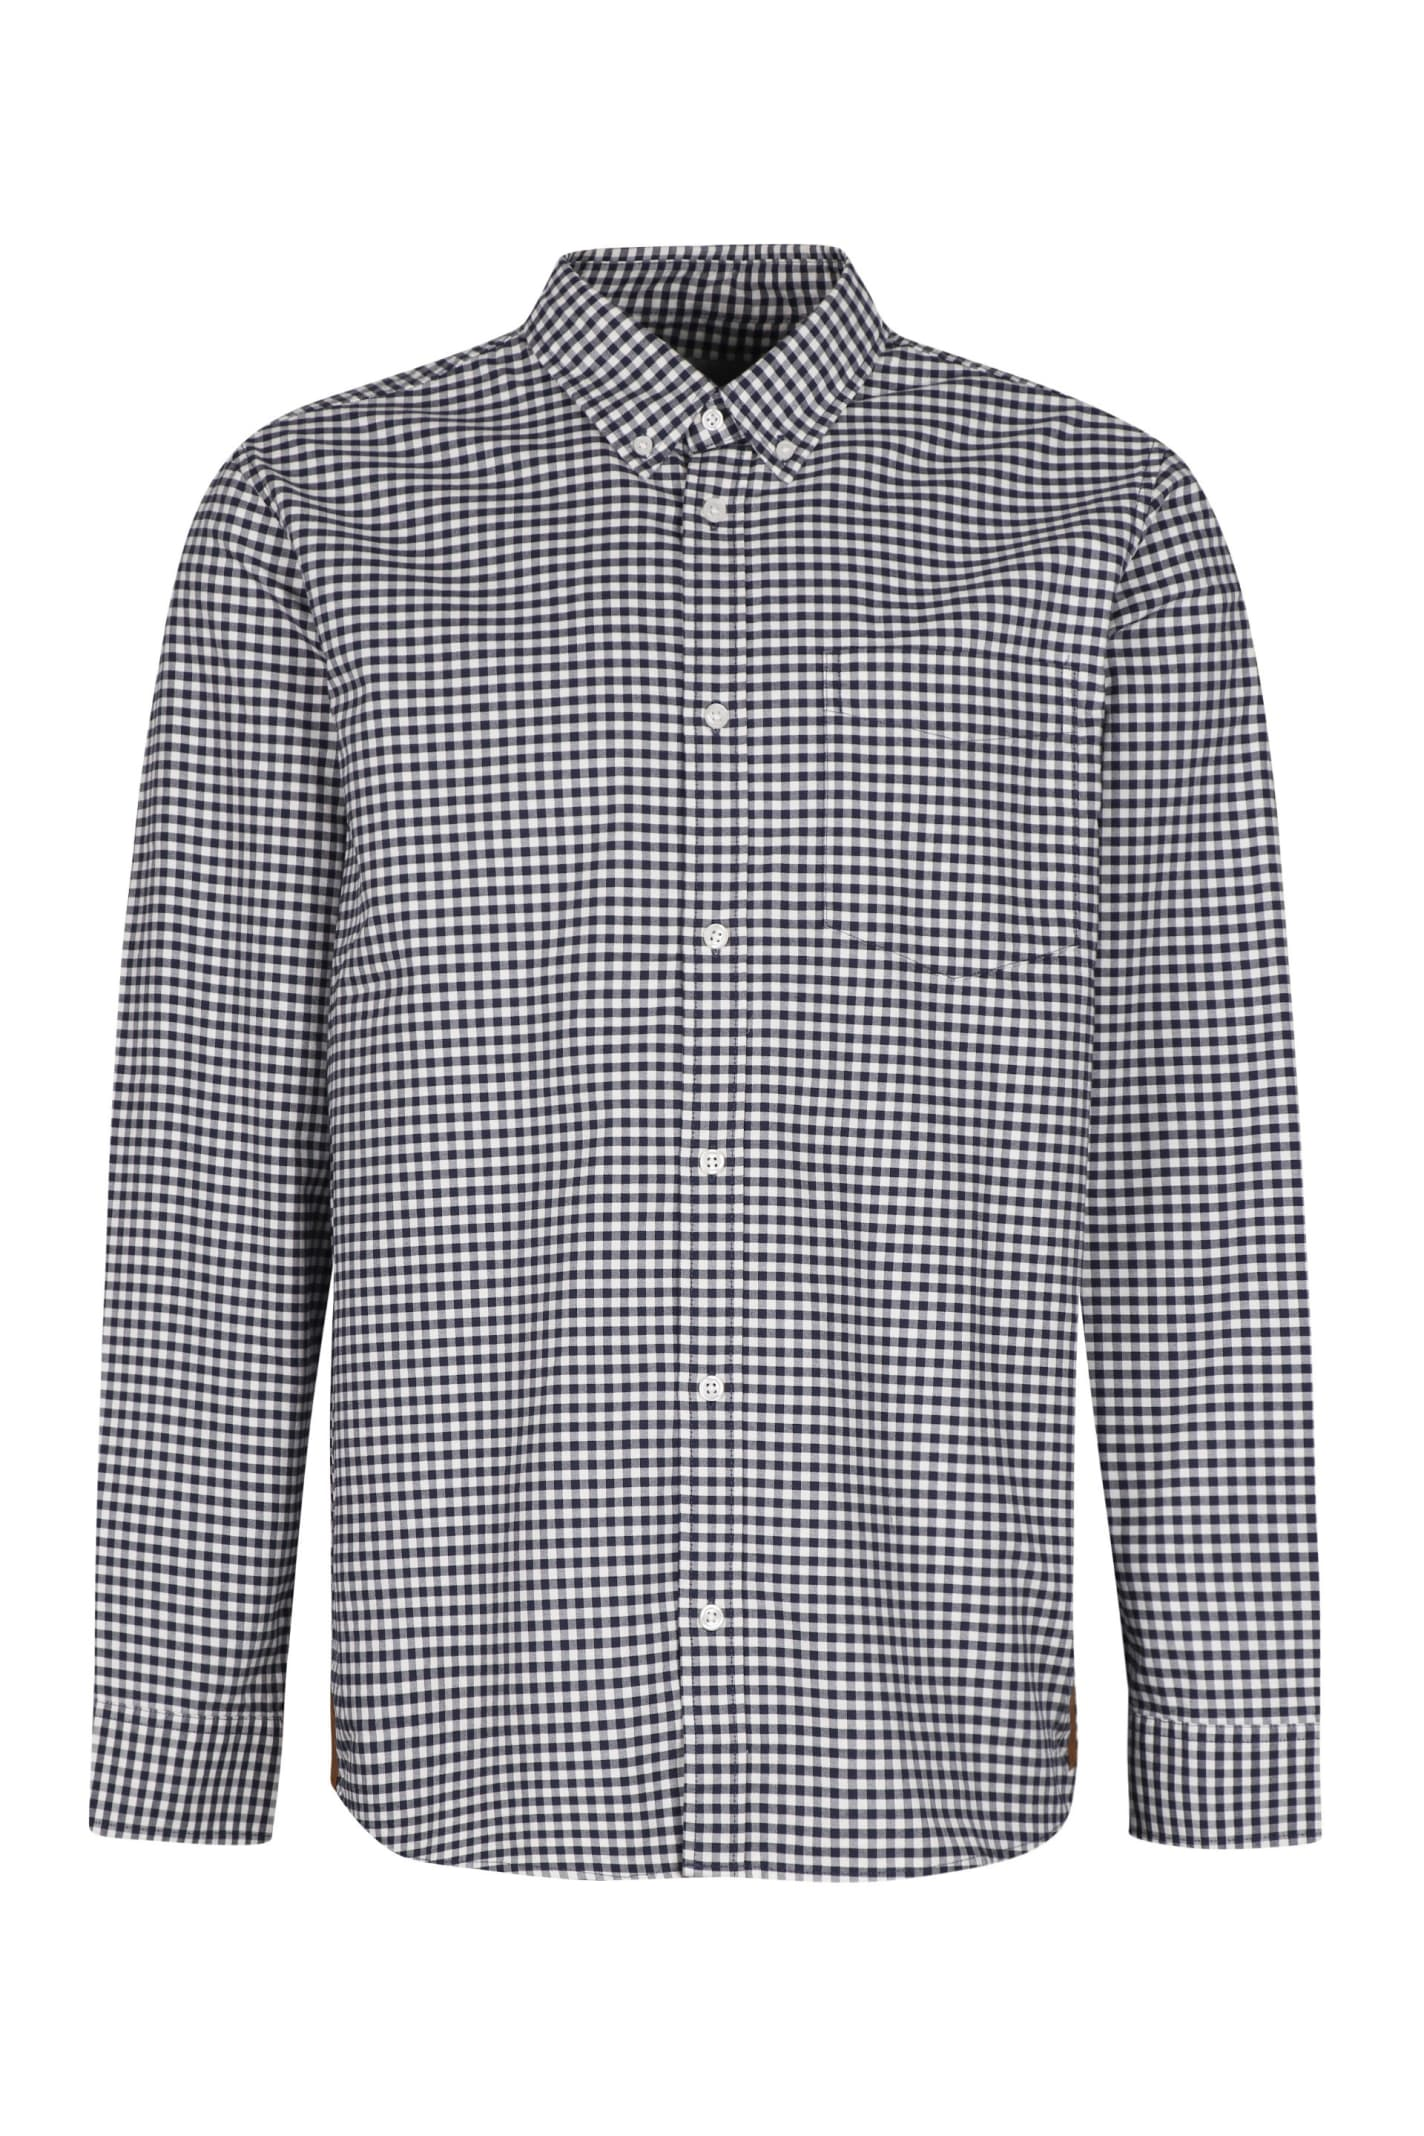 Bintley Checked Cotton Shirt